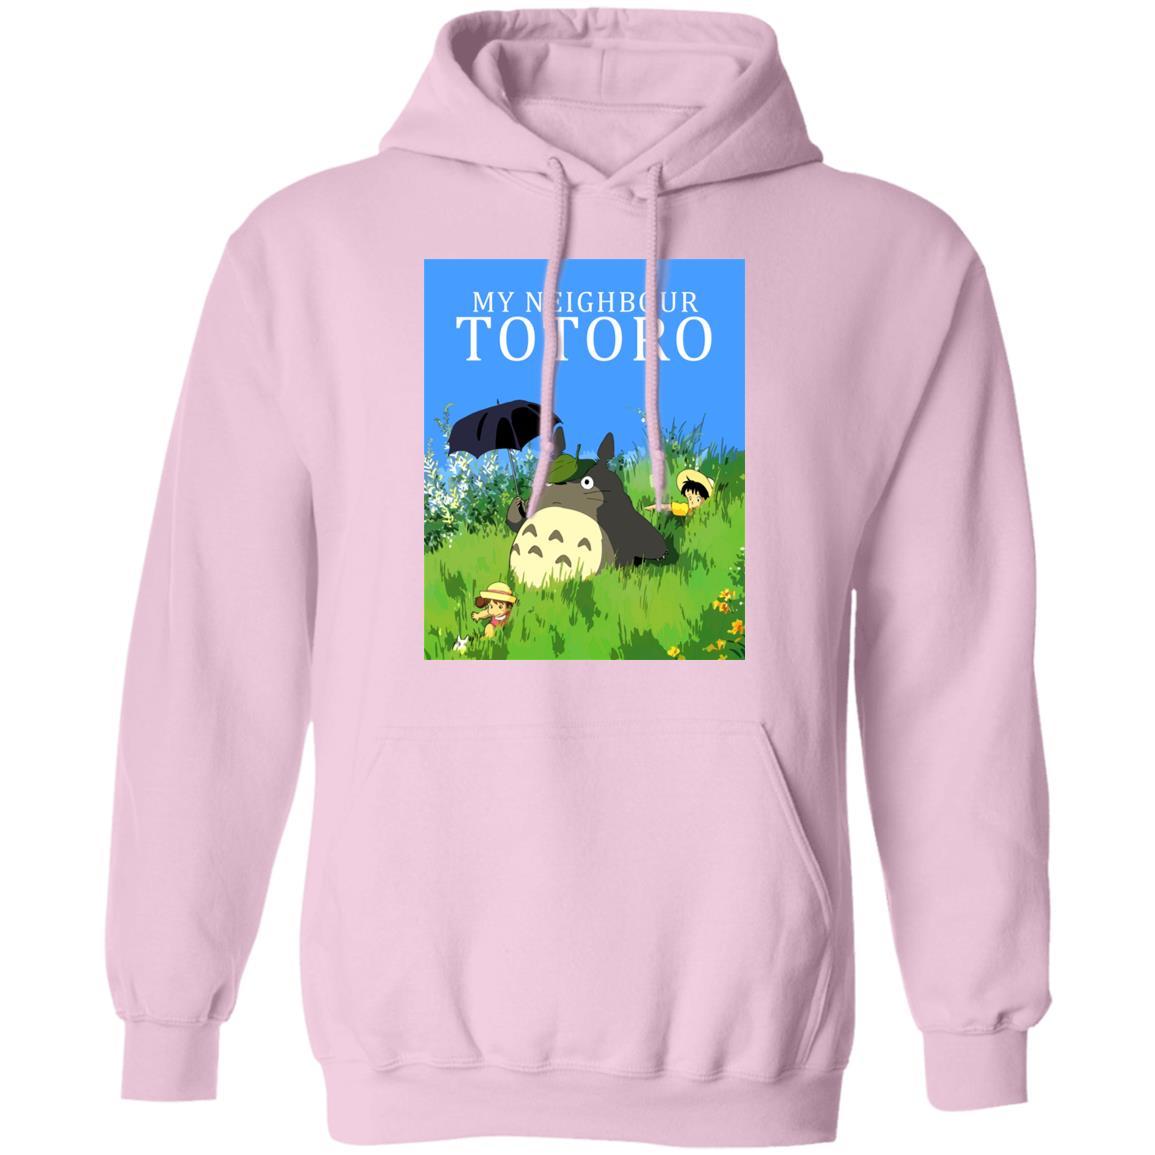 My Neighbor Totoro Hoodie Unisex